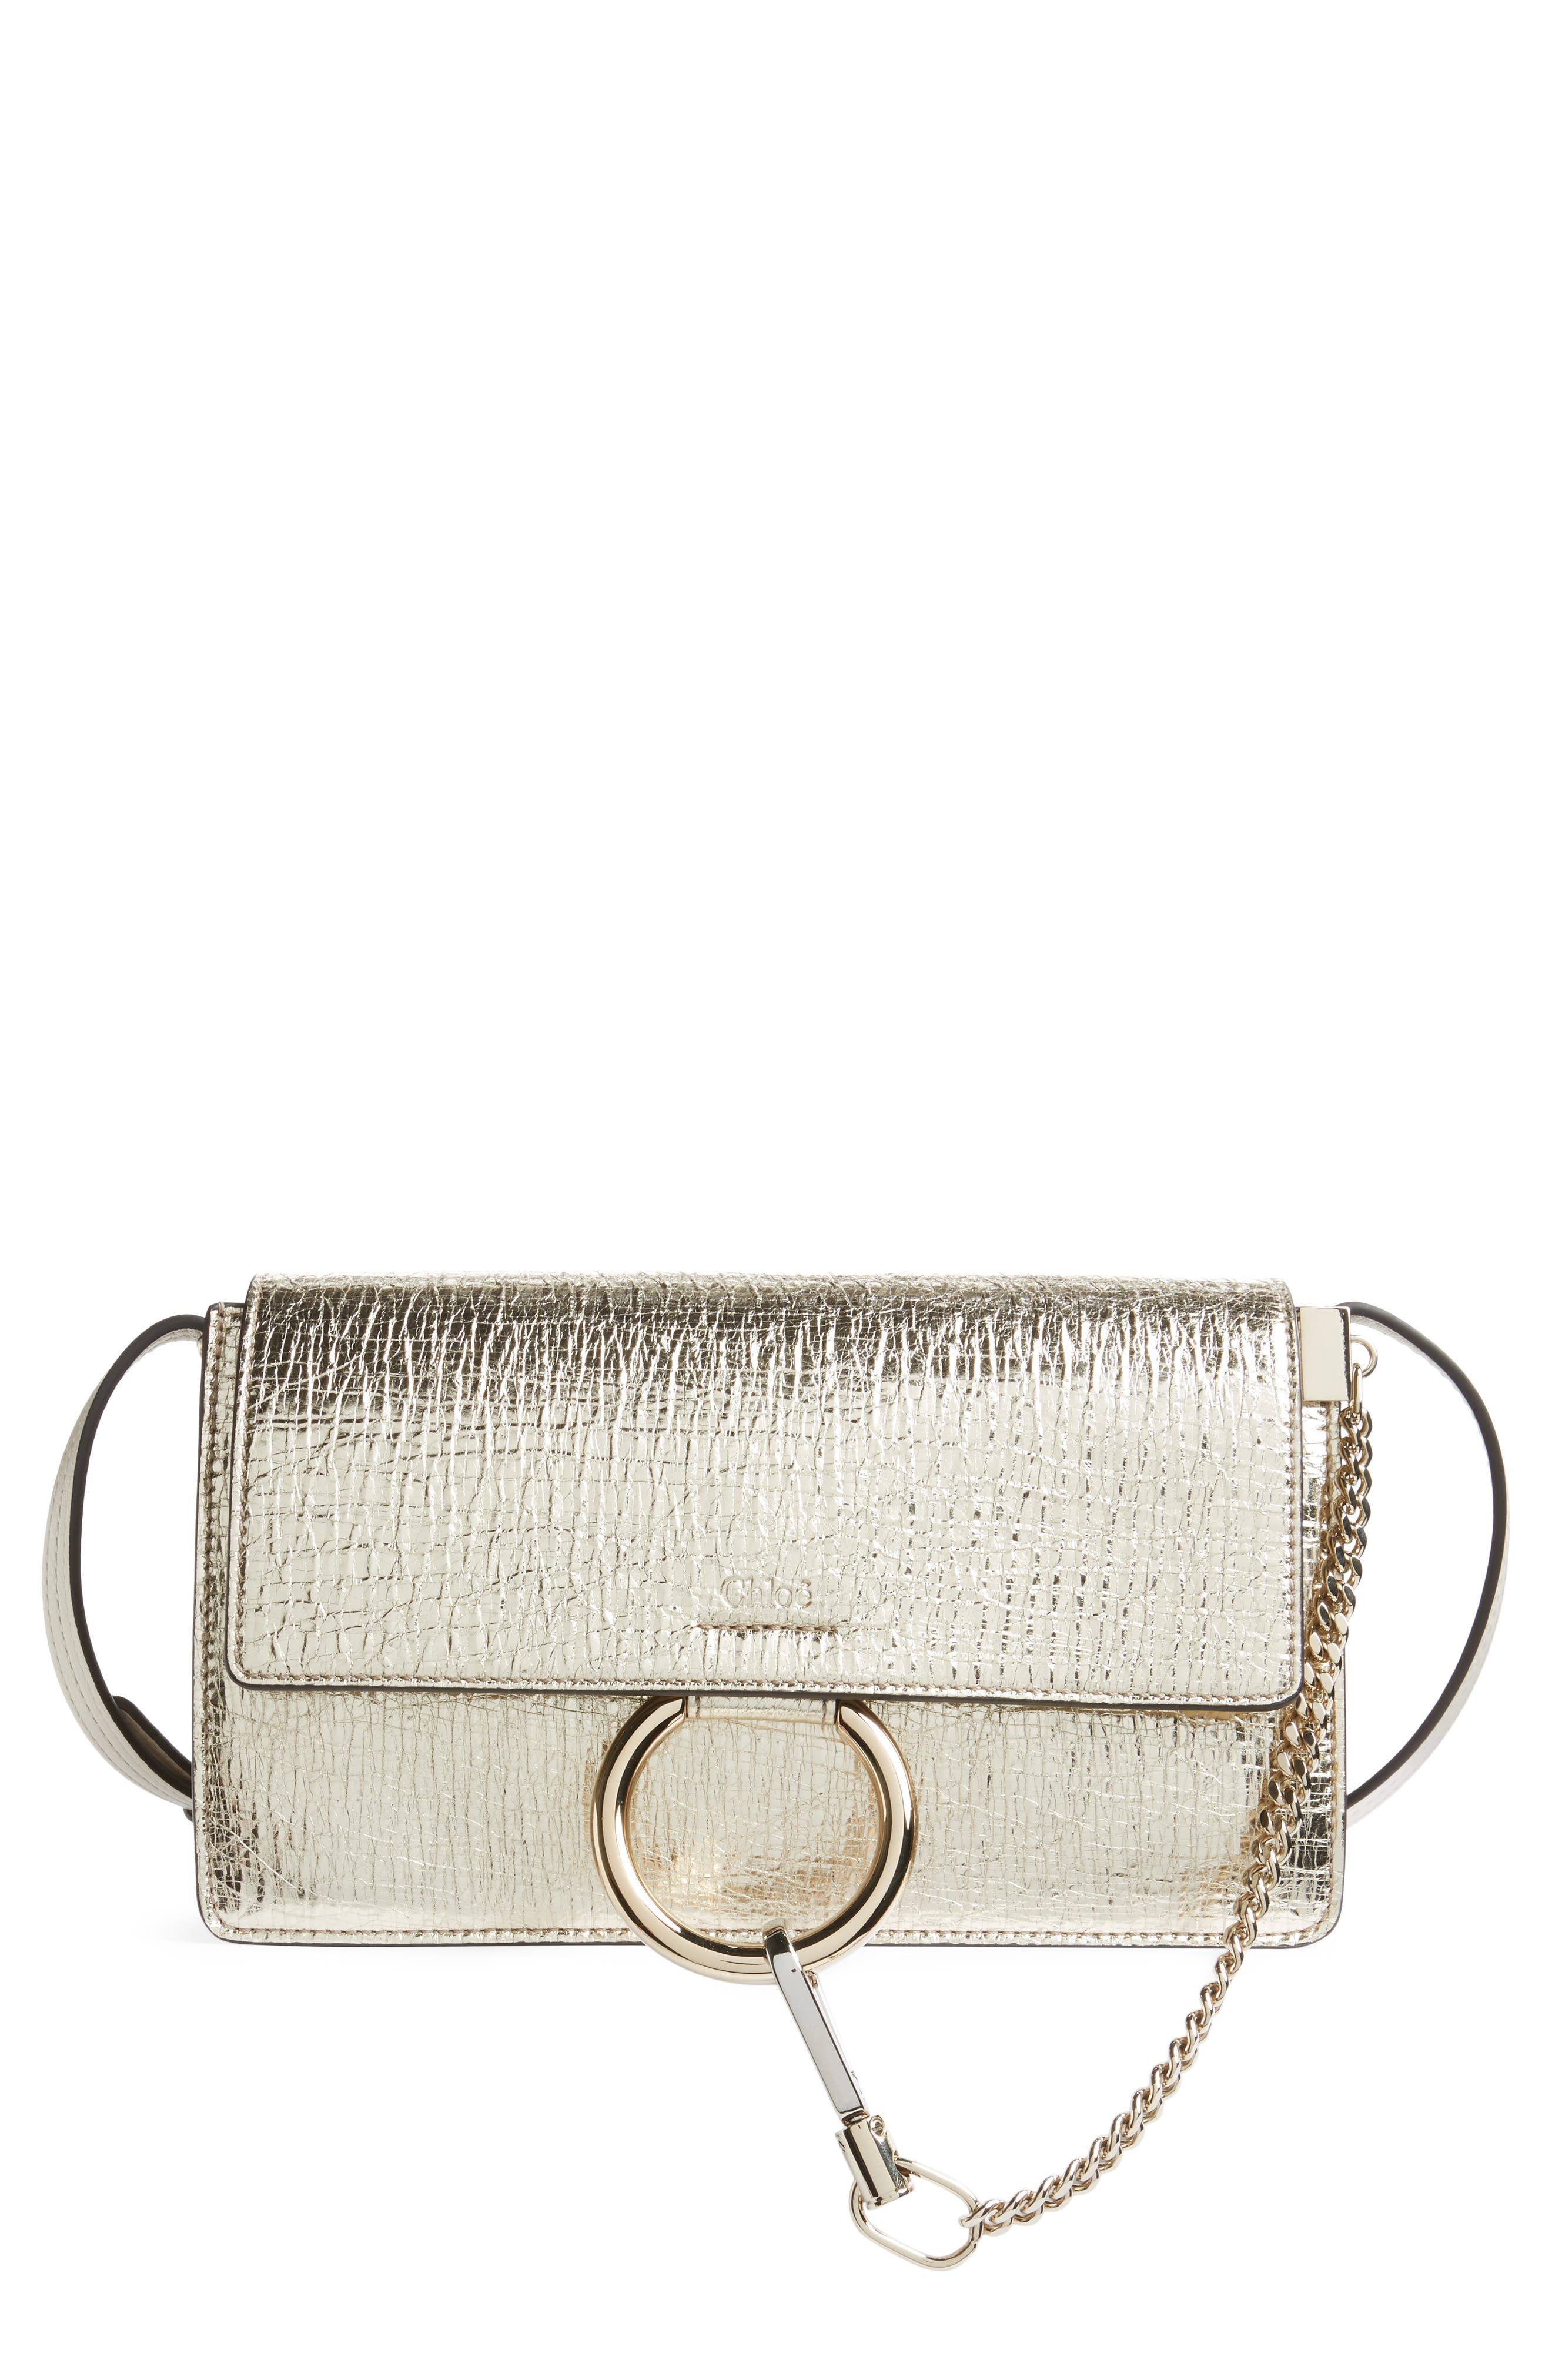 Small Faye Metallic Leather Shoulder Bag,                             Main thumbnail 1, color,                             GOLD